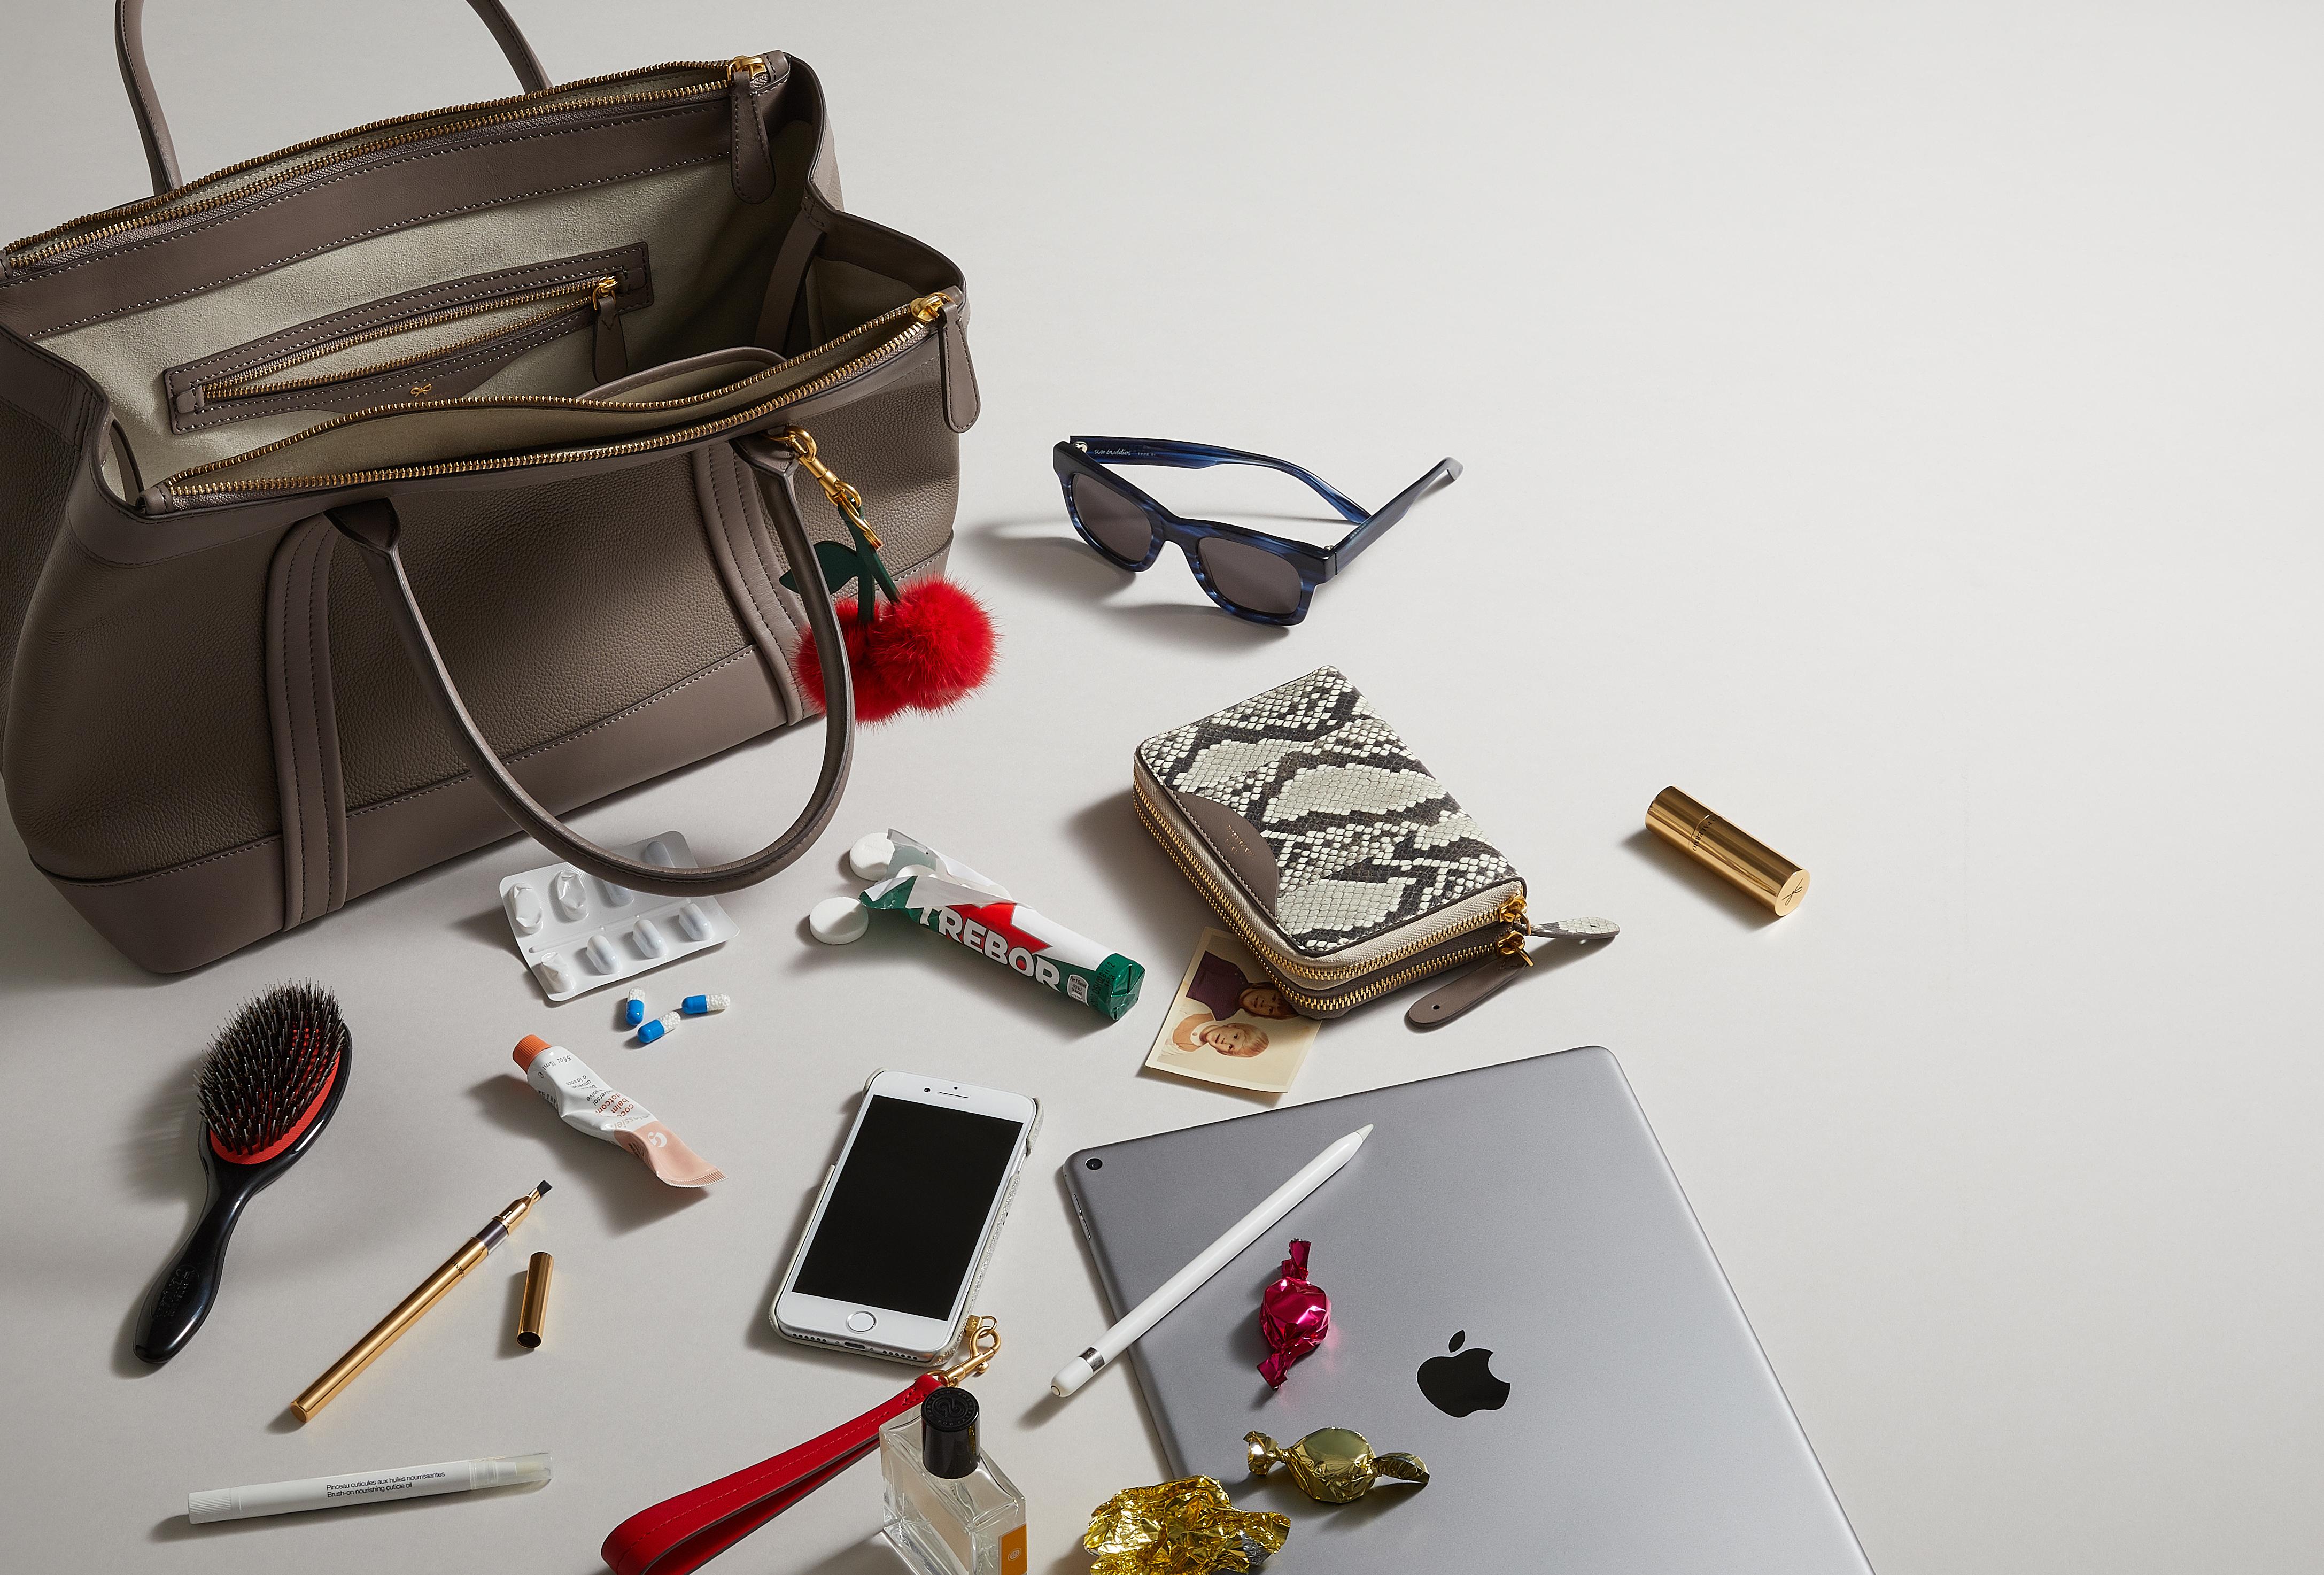 Anya Hindmarch - Bags That Work